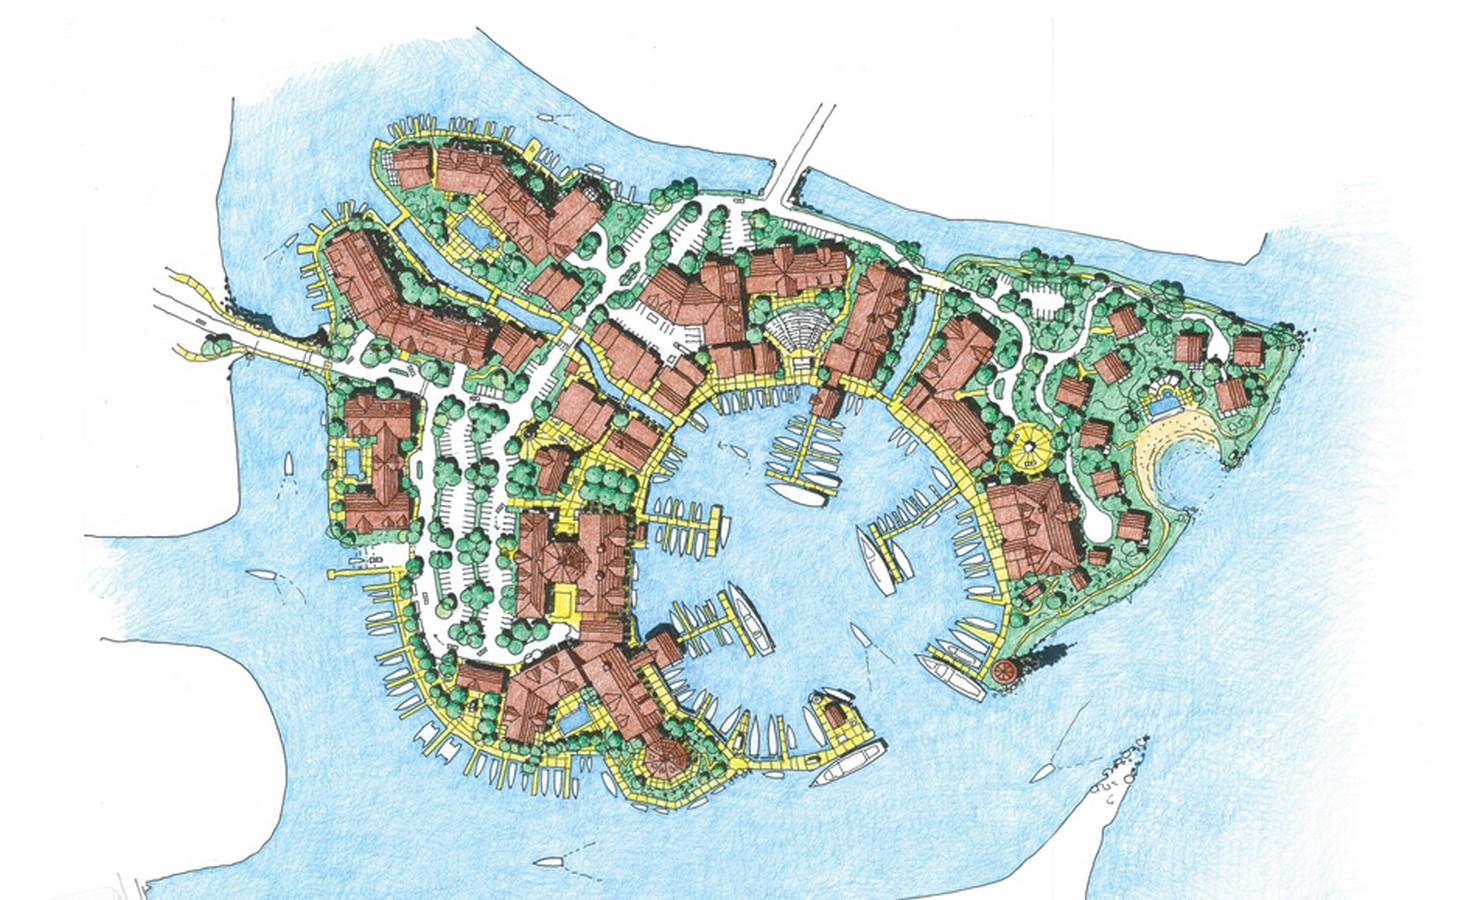 VITA Planning and Landscape Architecture - Sheet3